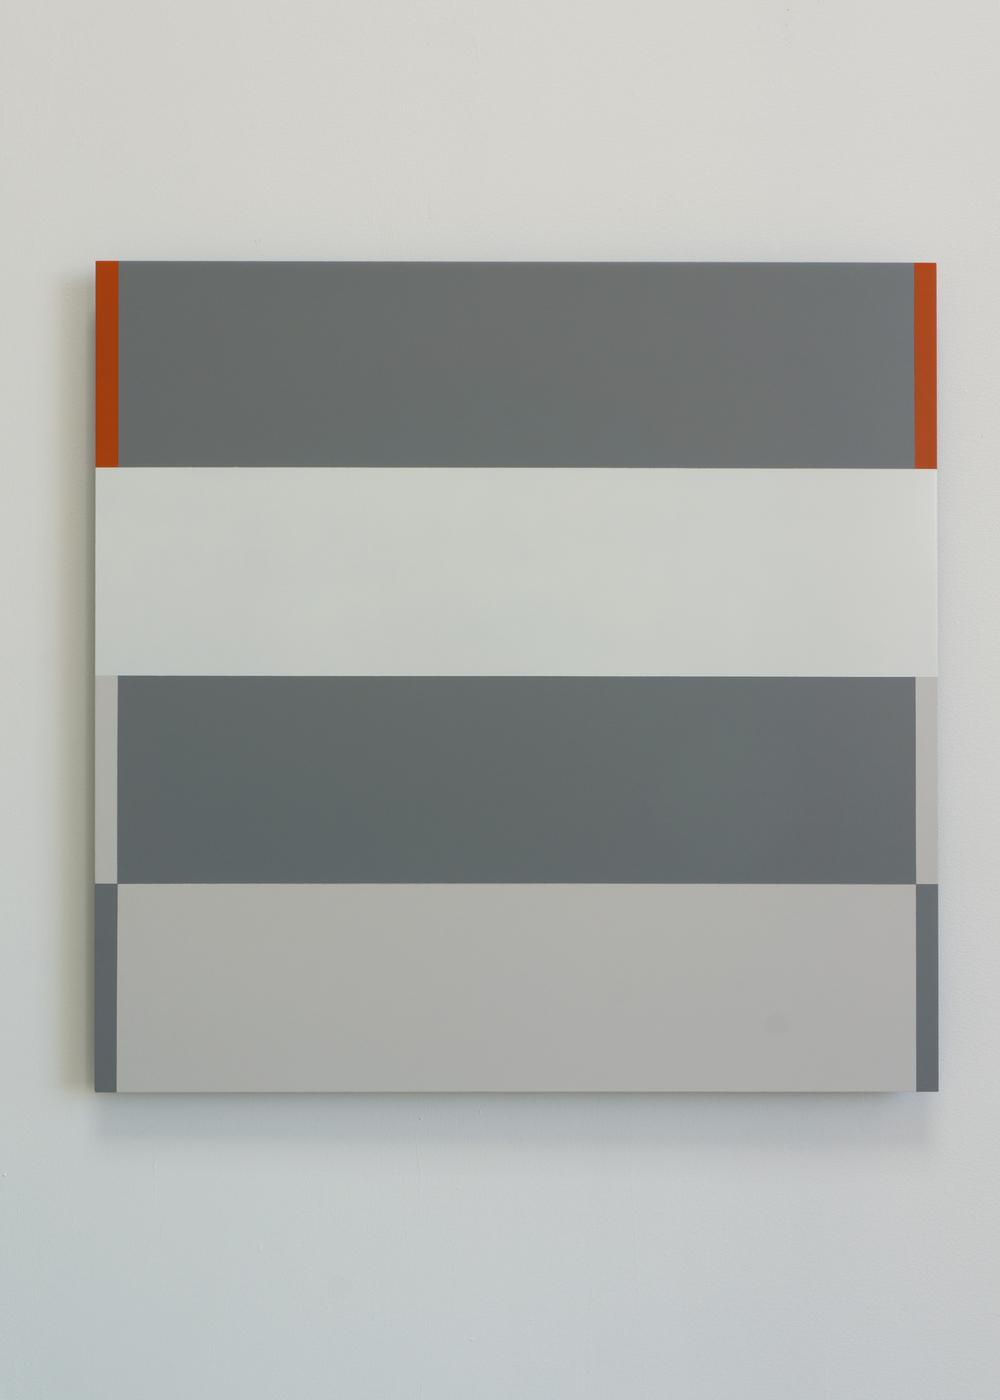 """2 Orange Corners""  2014  28"" x 28""  spray paint on aluminum"